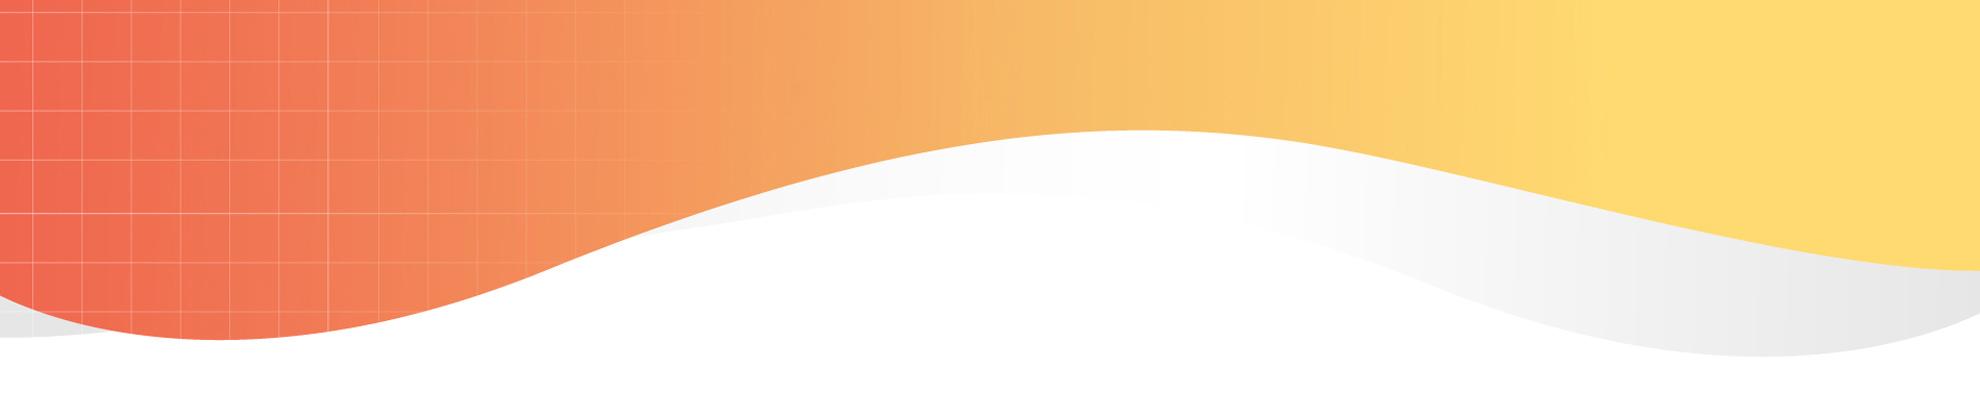 logo-top2-官方網頁設計,官方網站設計, 品牌網站設計, 網站設計, 網頁設計, 響應式網頁設計, 公司網站設計, 公司網站, 產品網站, LOGO設計, 設計LOGO, 設計品牌, 創意設計, 品牌設計, 商標設計, 平面設計, 視覺設計, 名片設計, 產品設計, 包裝設計, 網頁設計, 網站設計, CIS企業識別設計, CIS, LOGO, DESIGN, brochure, Flyerlogo-top2_網站設計_網頁設計_響應式網頁設計_公司網站設計_公司網站_產品網站_LOGO設計_設計LOGO_設計品牌_創意設計_品牌設計_商標設計_平面設計_視覺設計_名片設計_產品設計_包裝設計_網頁設計_網站設計_CIS企業識別設計_CIS_LOGO_DESIGN_brochure_Flyer